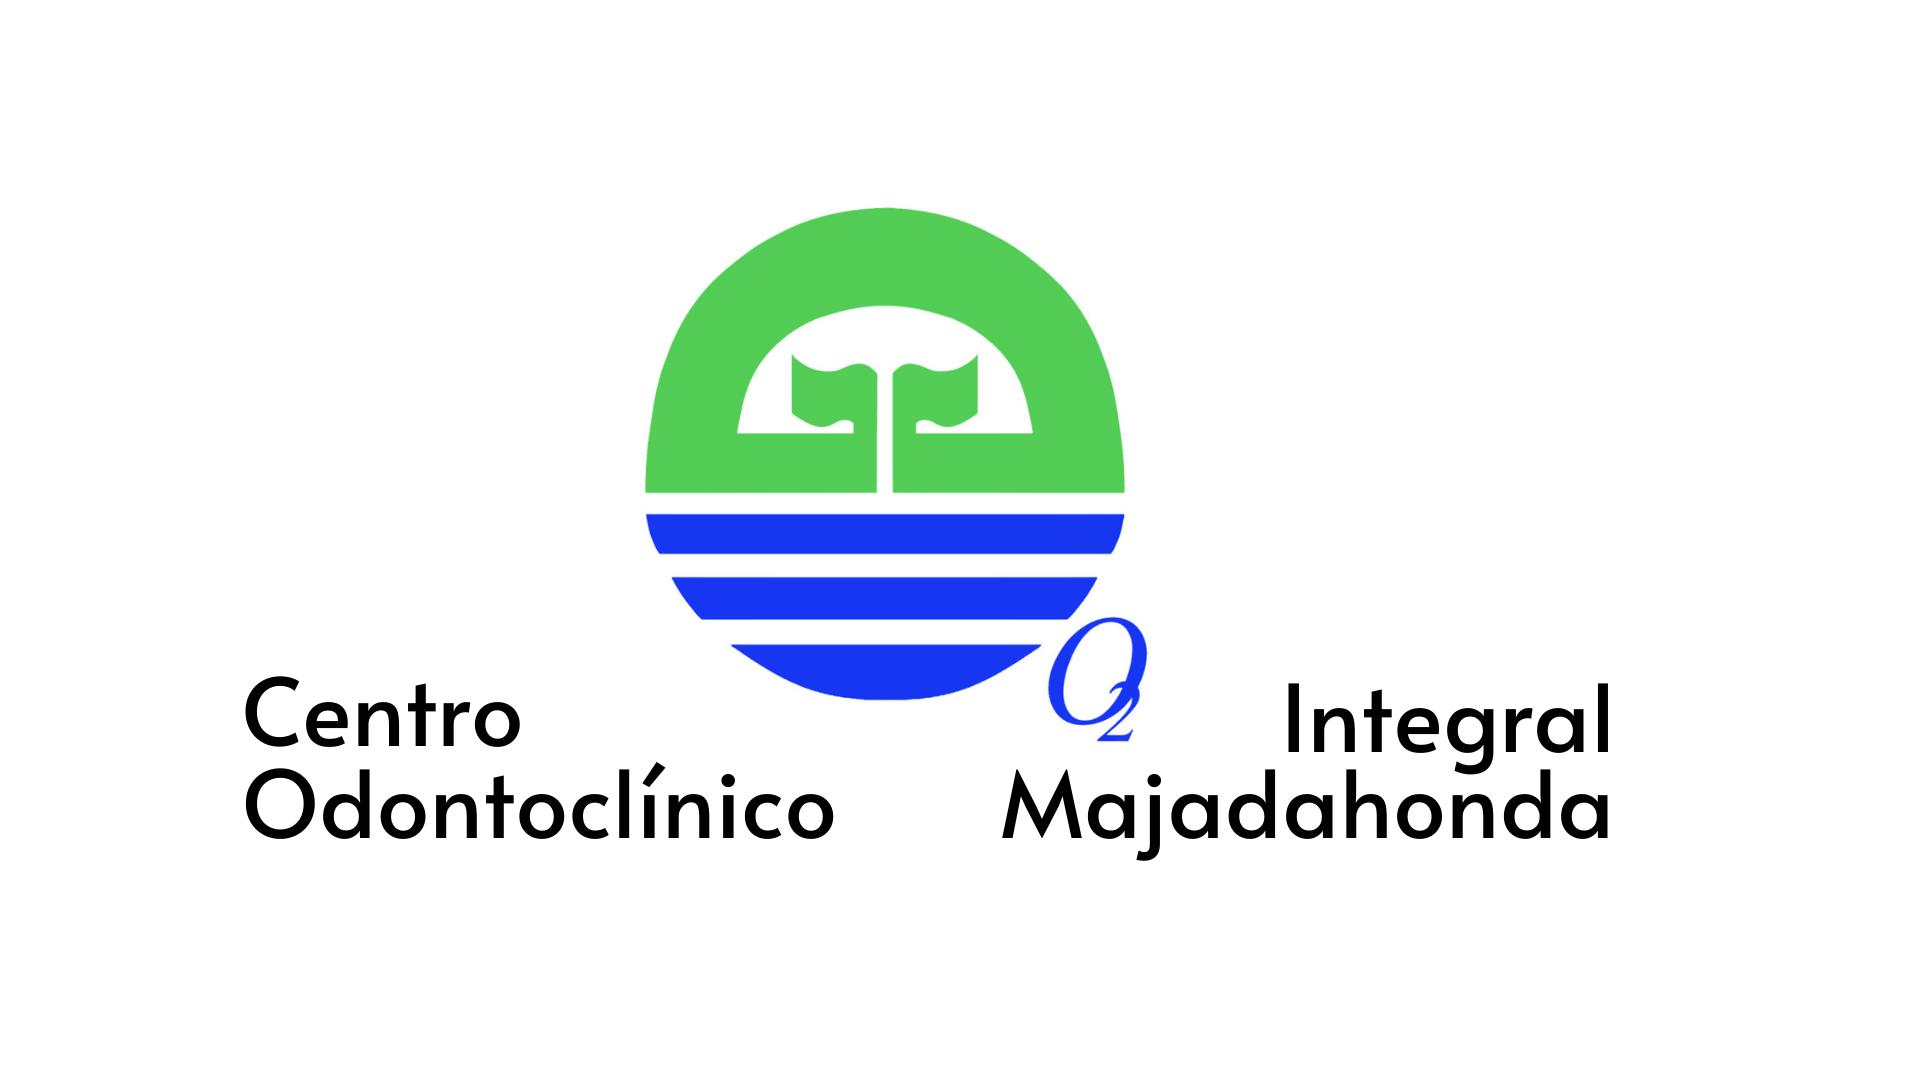 Centro Odontoclínico Integral Majadahonda